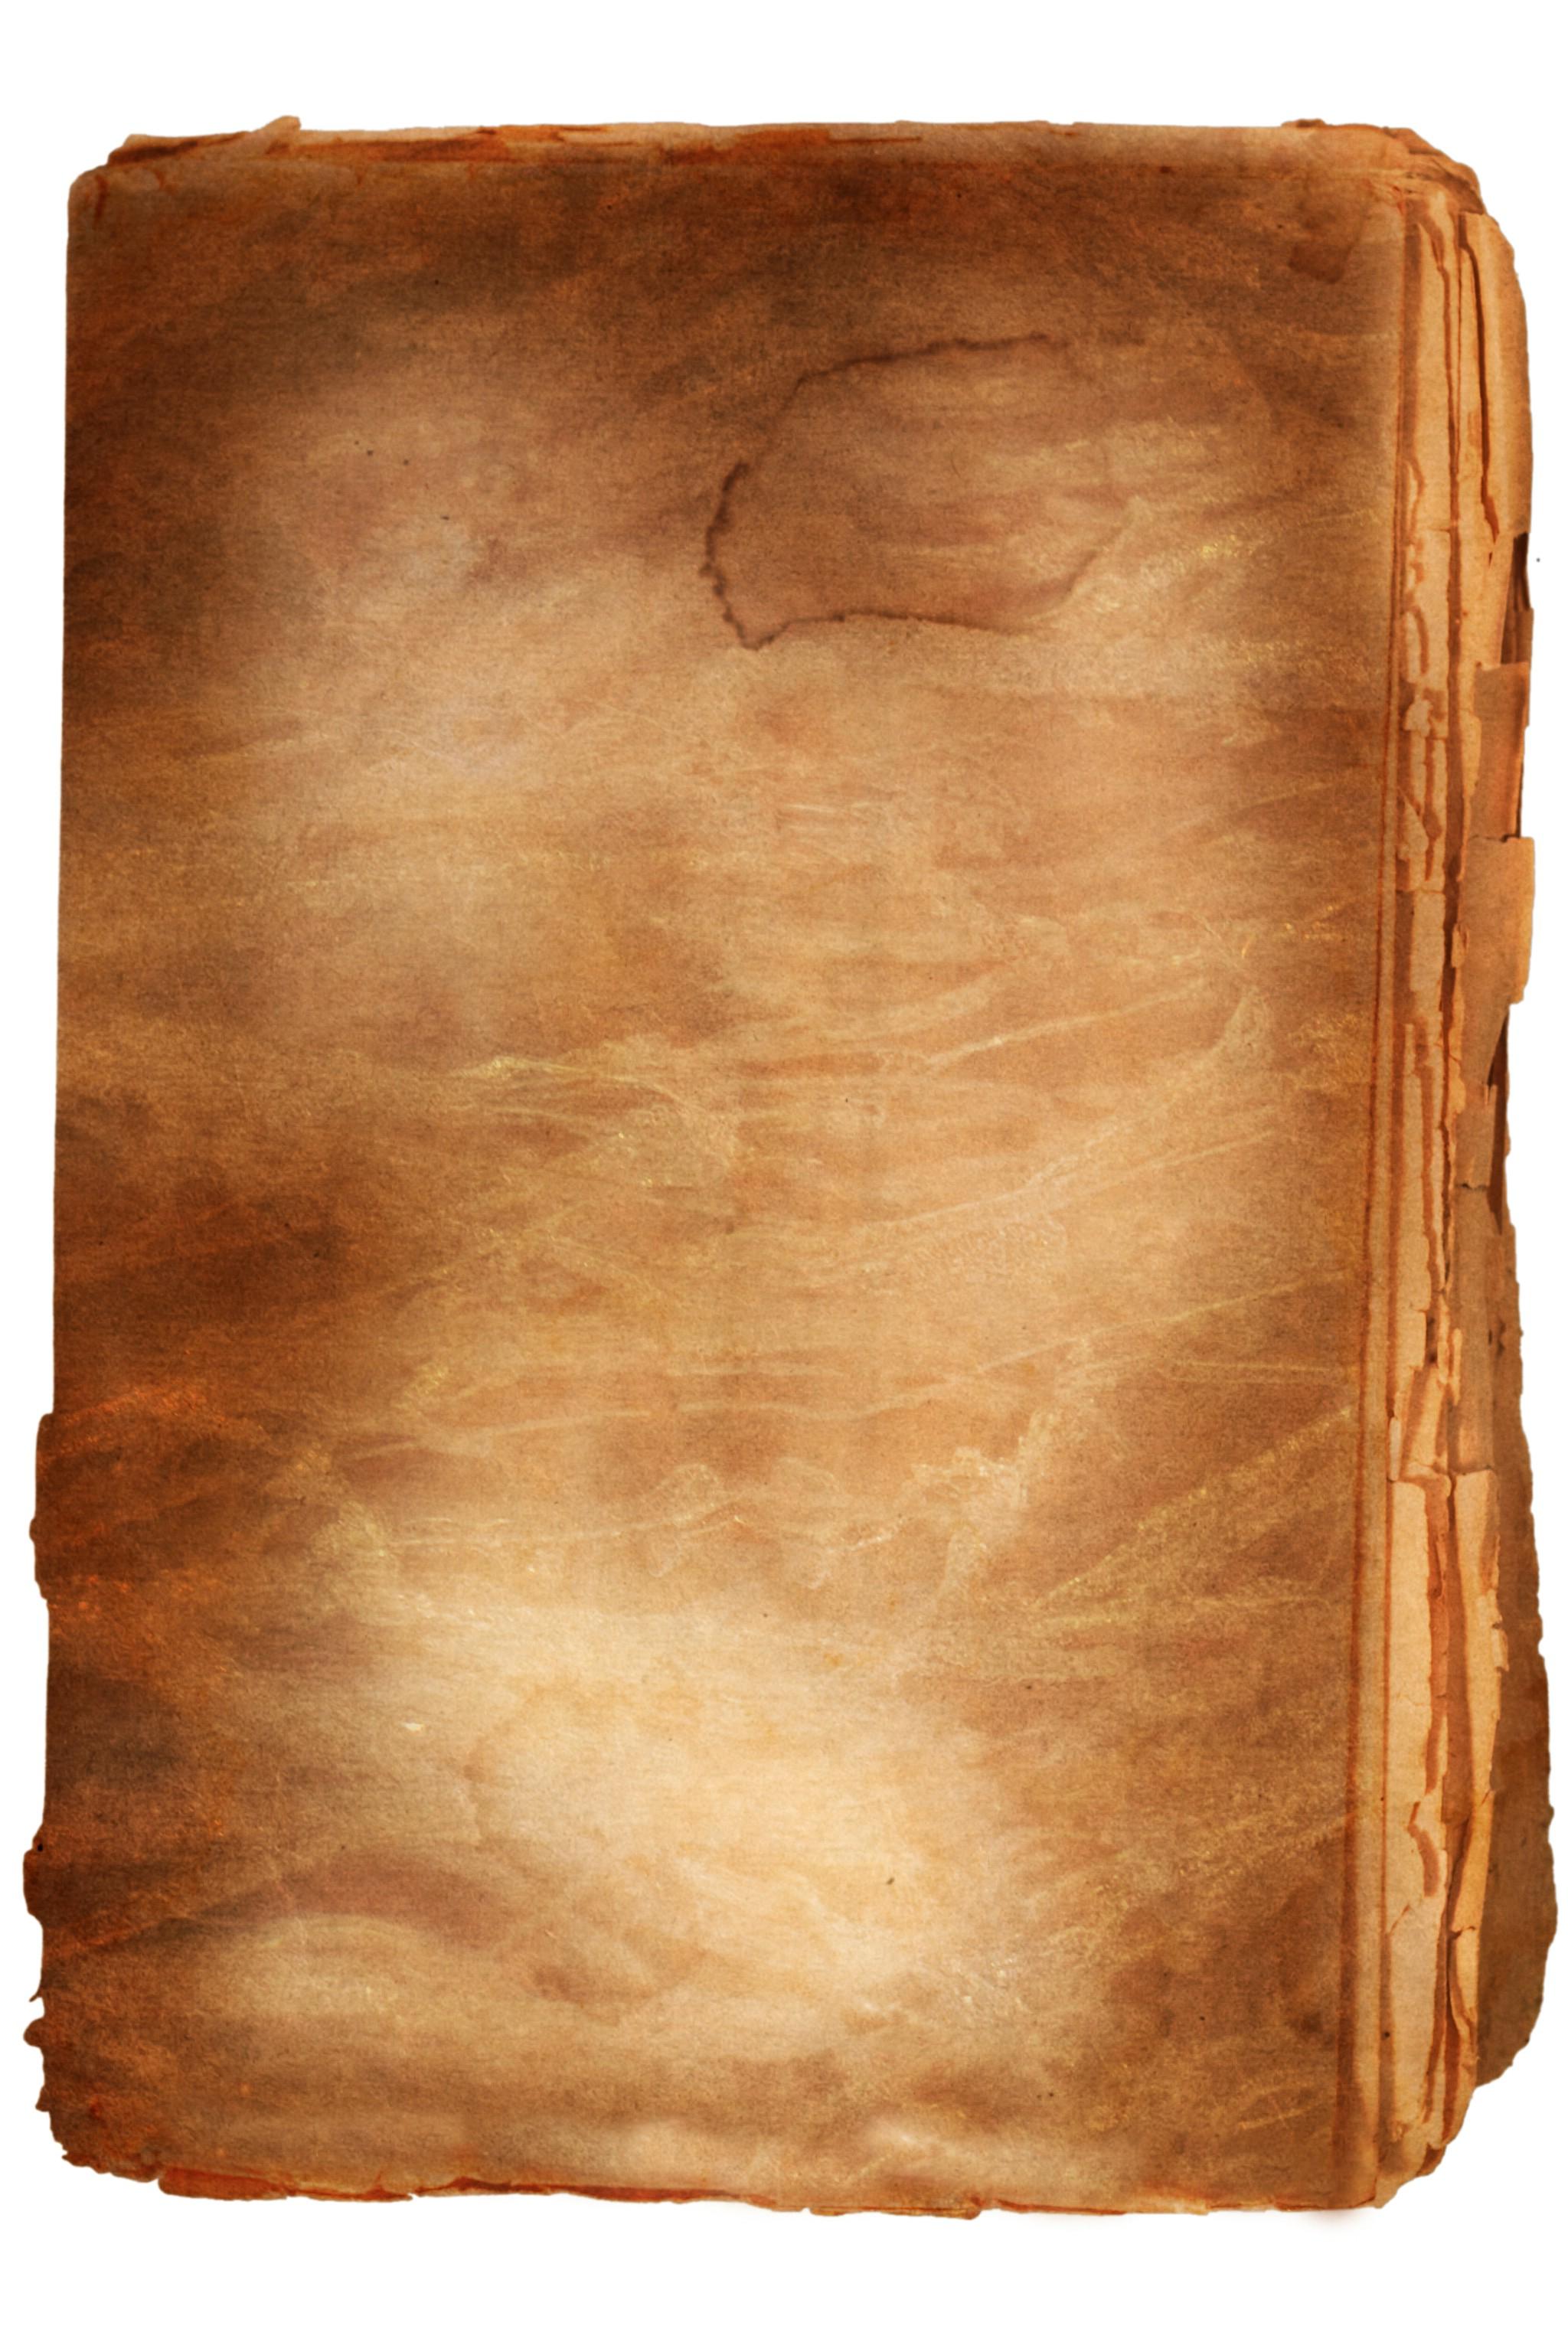 Текстура Бумаги Для Фотошопа